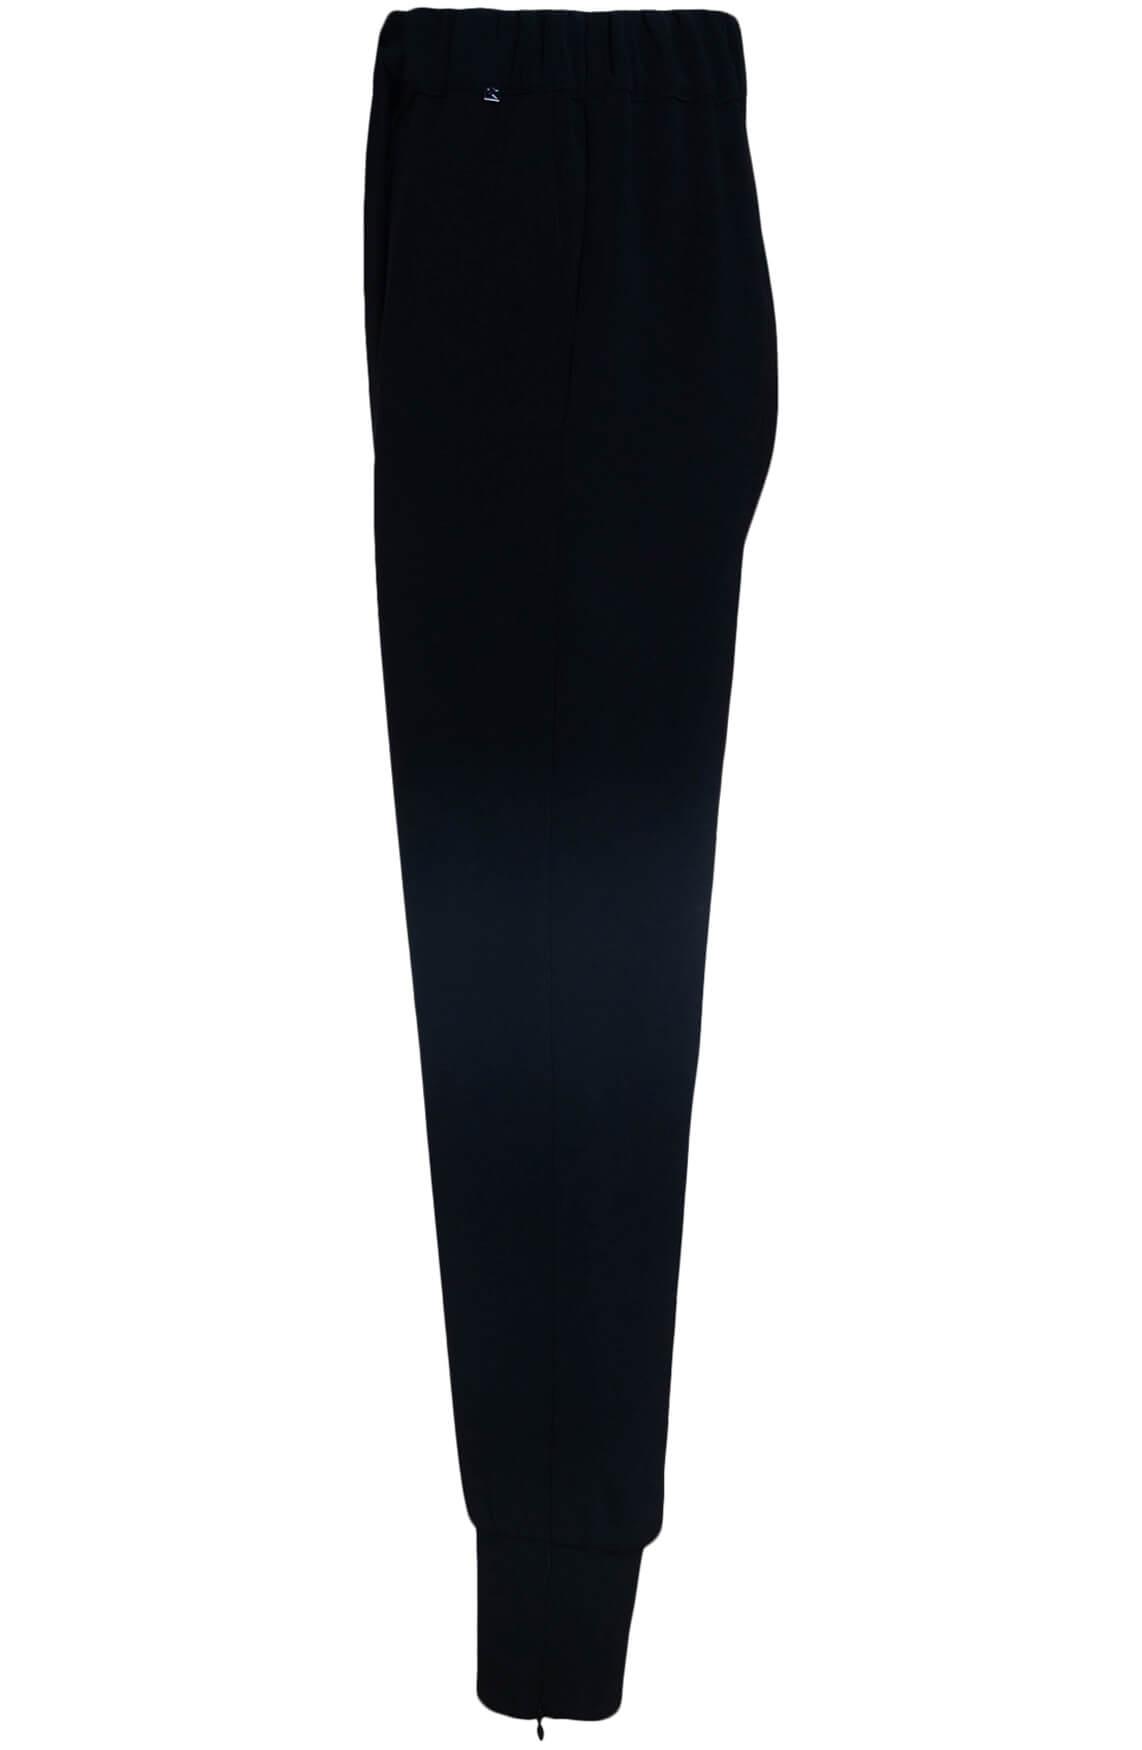 Kocca Dames Midnigia pant zwart